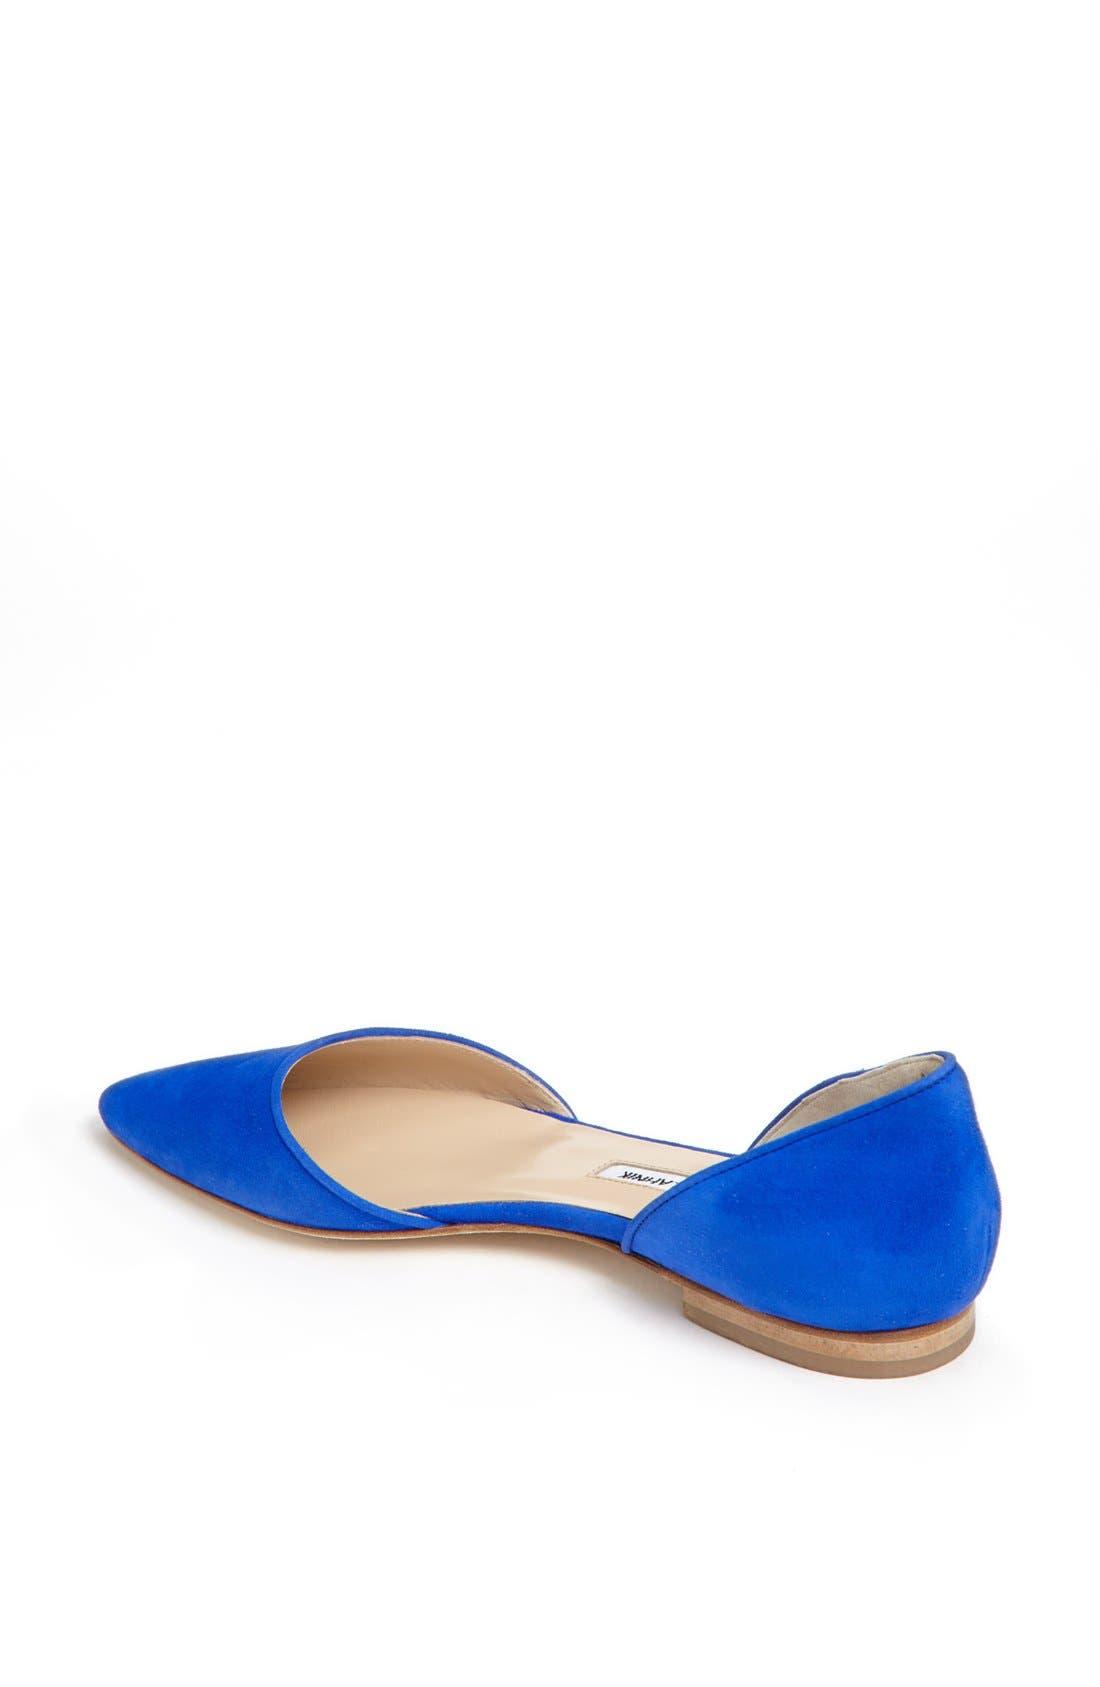 Alternate Image 2  - Manolo Blahnik 'Soussaba' Suede Pointed Toe Flat